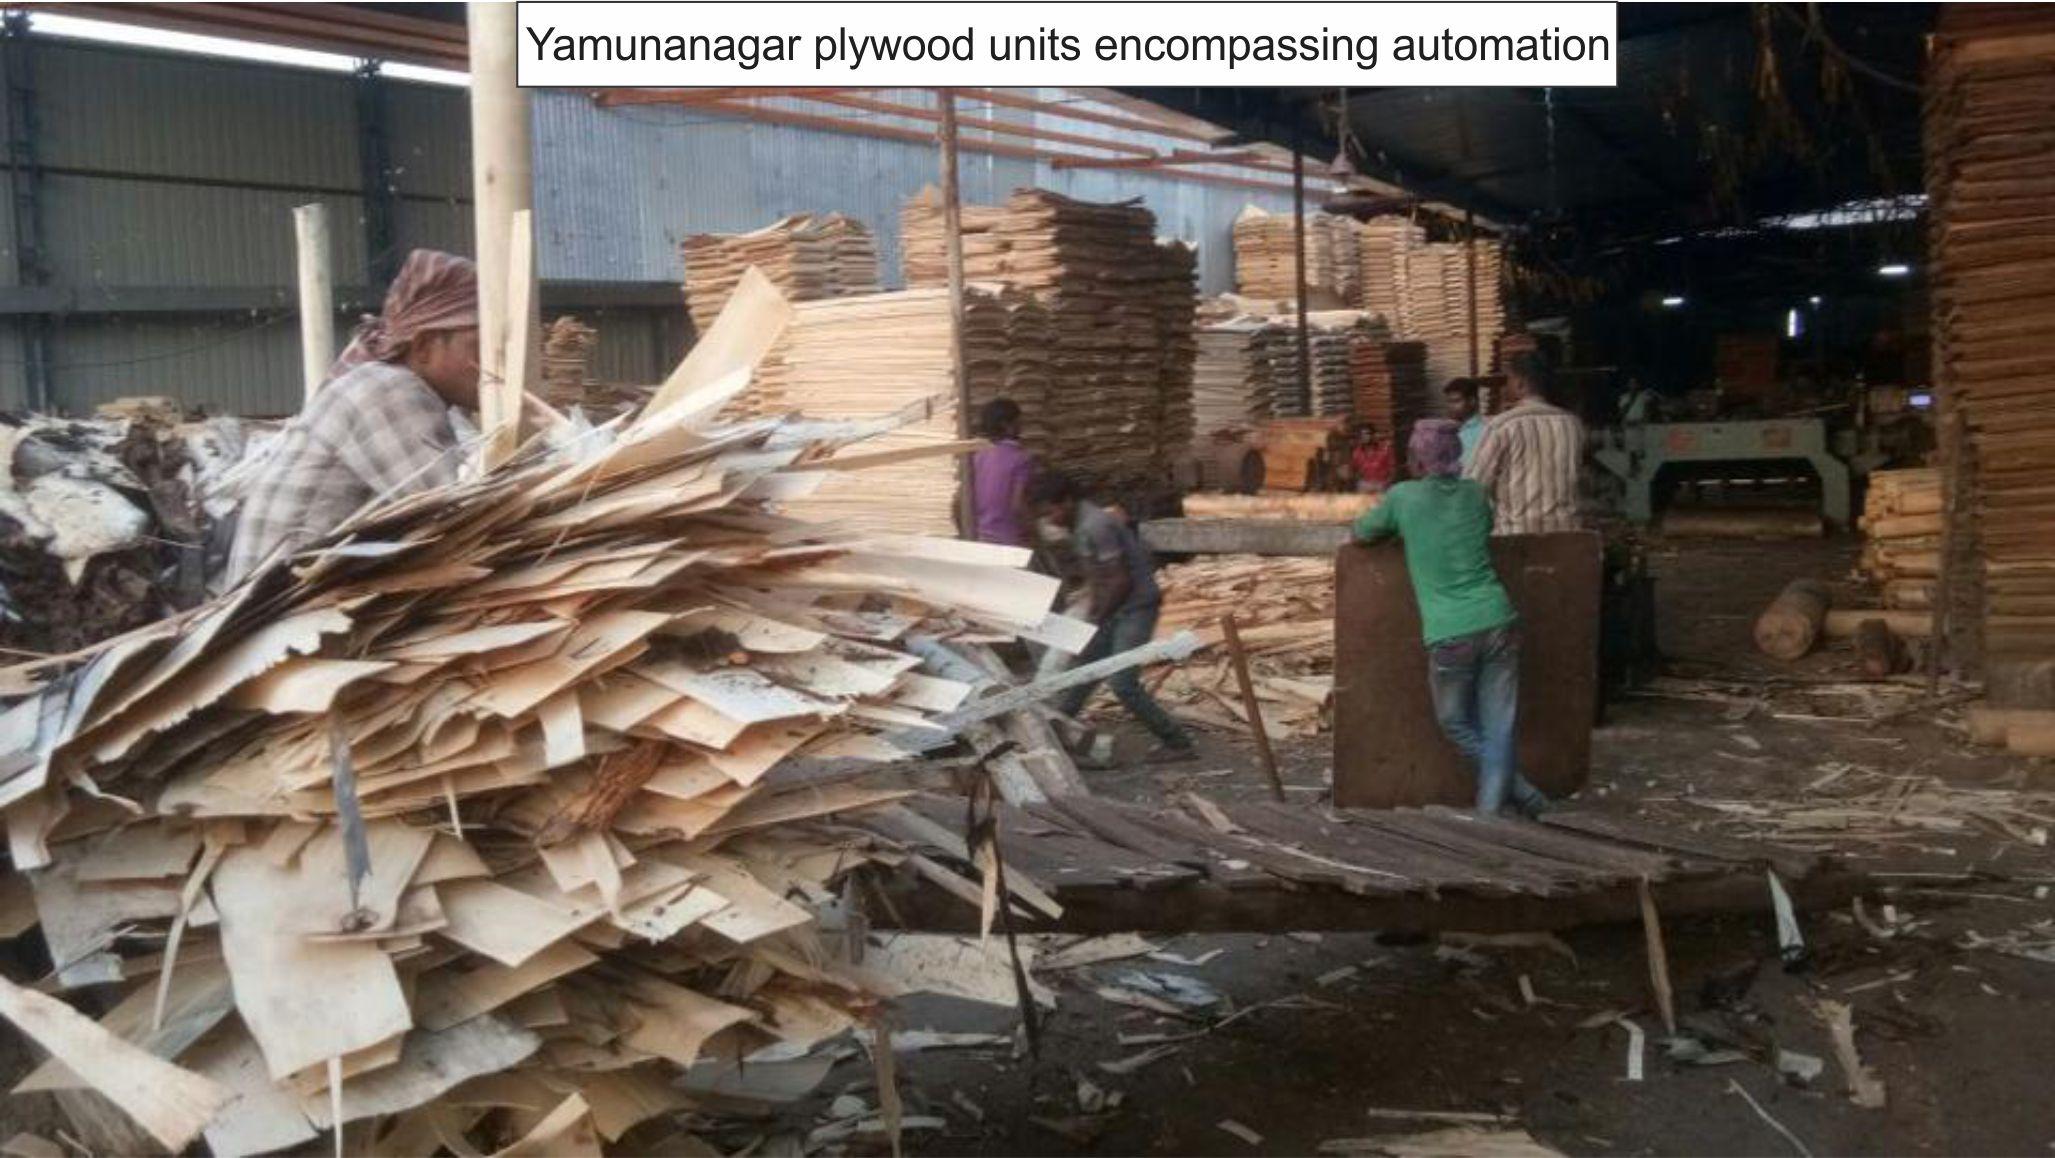 Yamunanagar plywood units encompassing automation